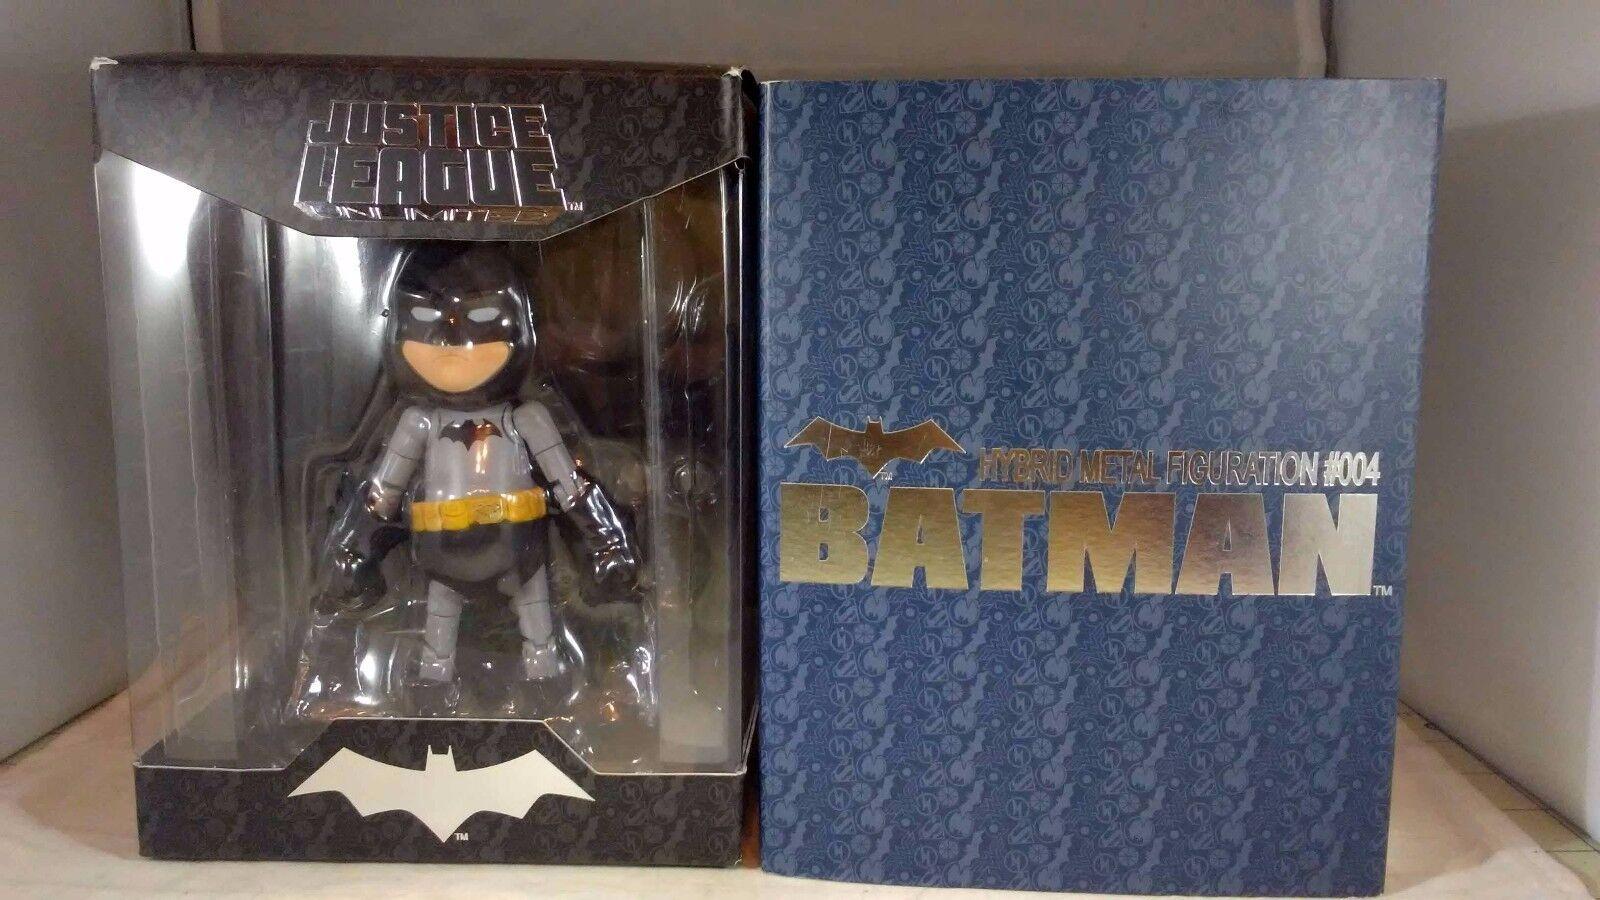 Herocross Justice League Unlimited Hybrid Metal Figuration 004 Batman